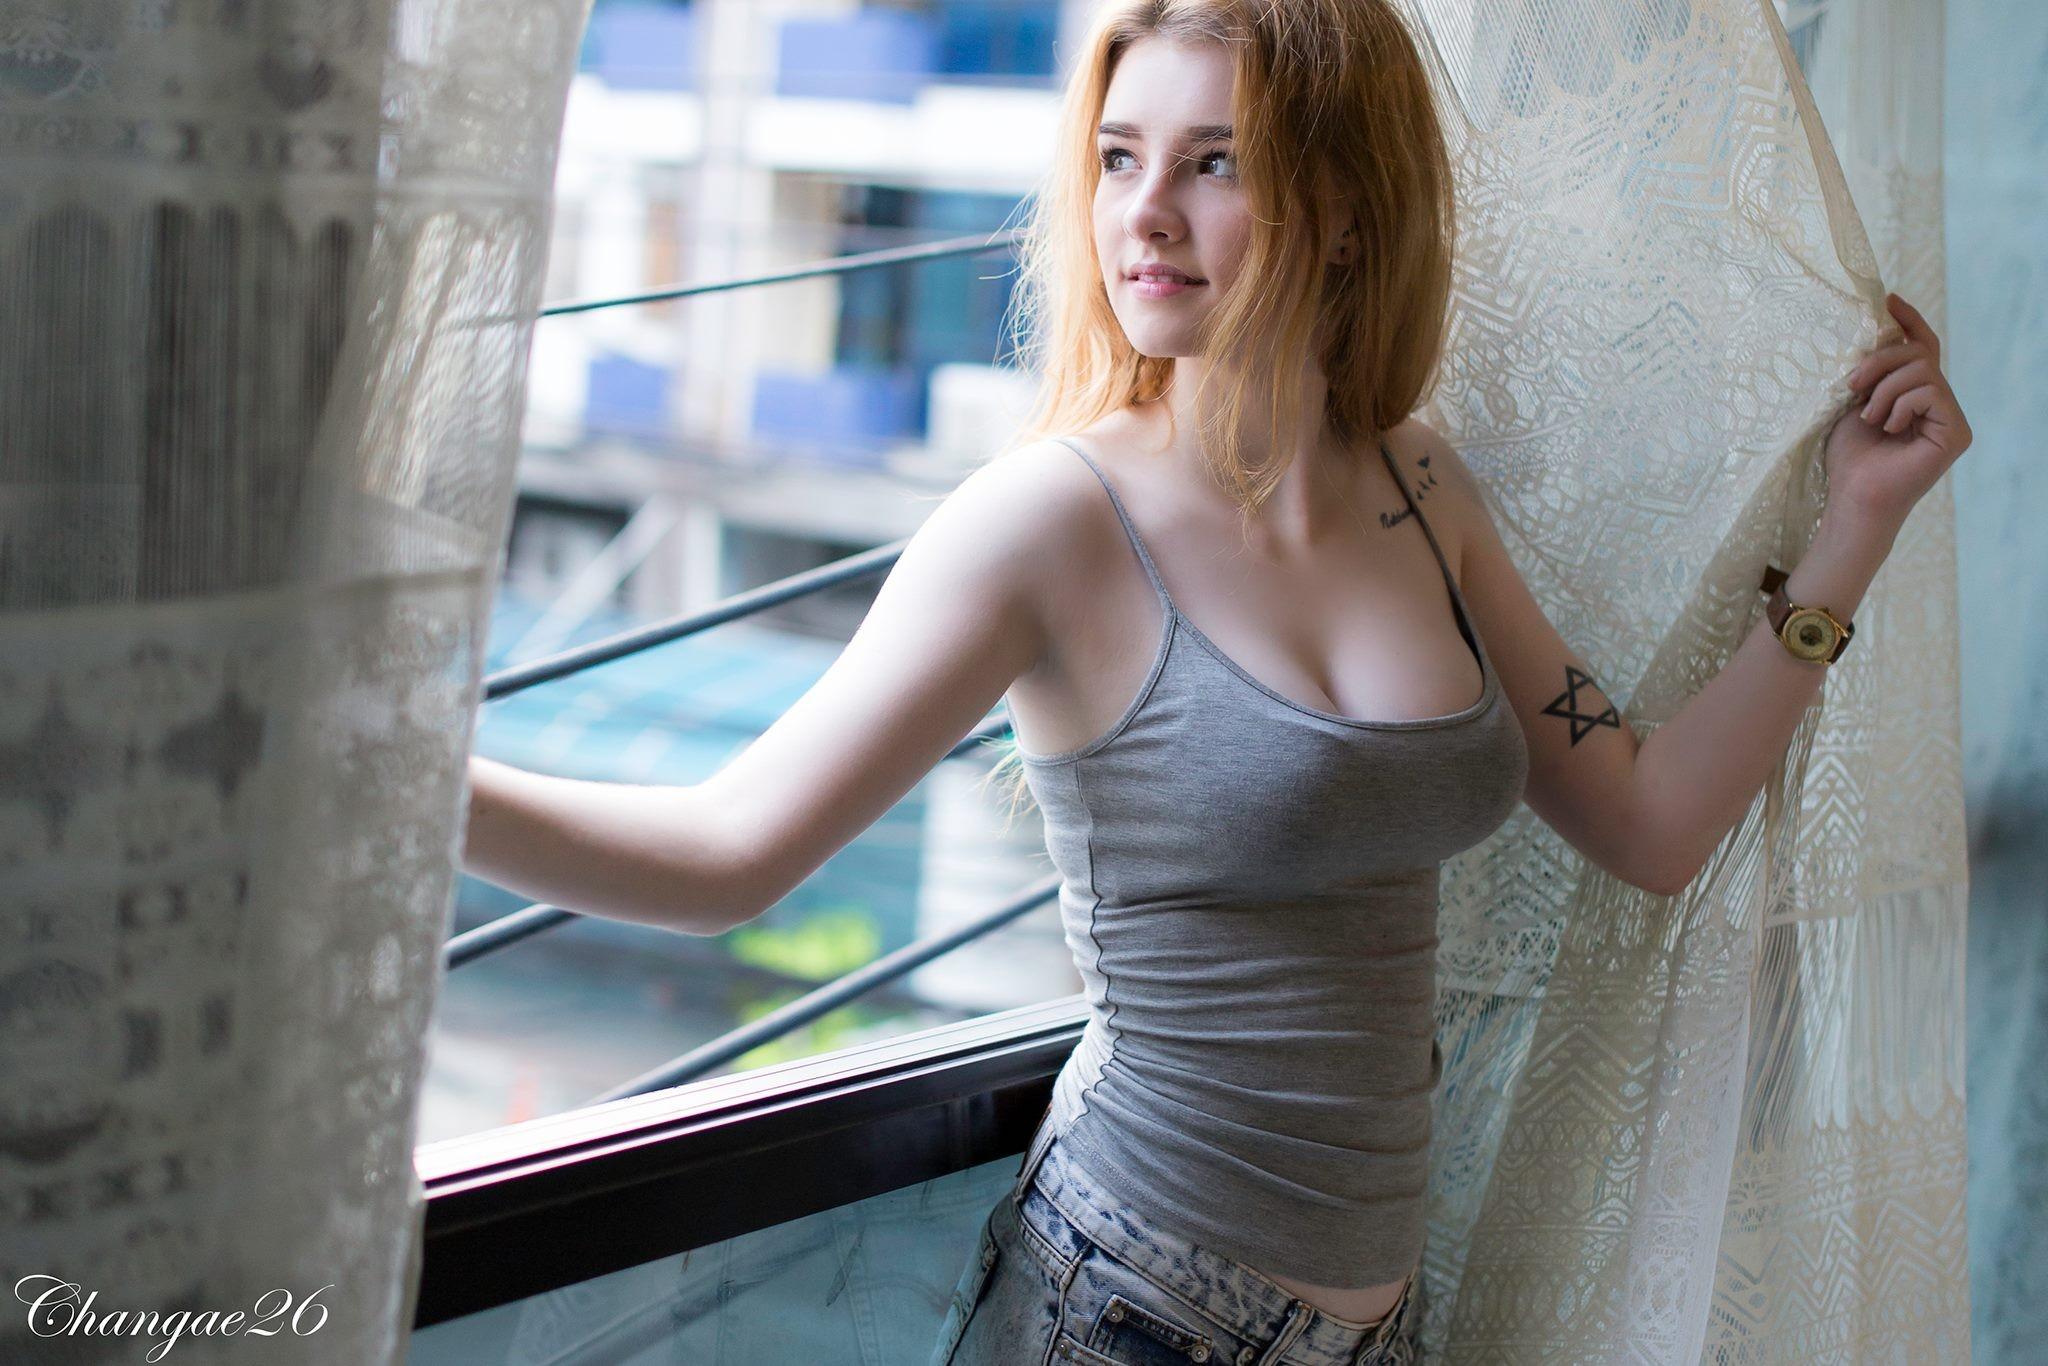 Angela White, big boobs, brunette, blue eyes, curvy, women